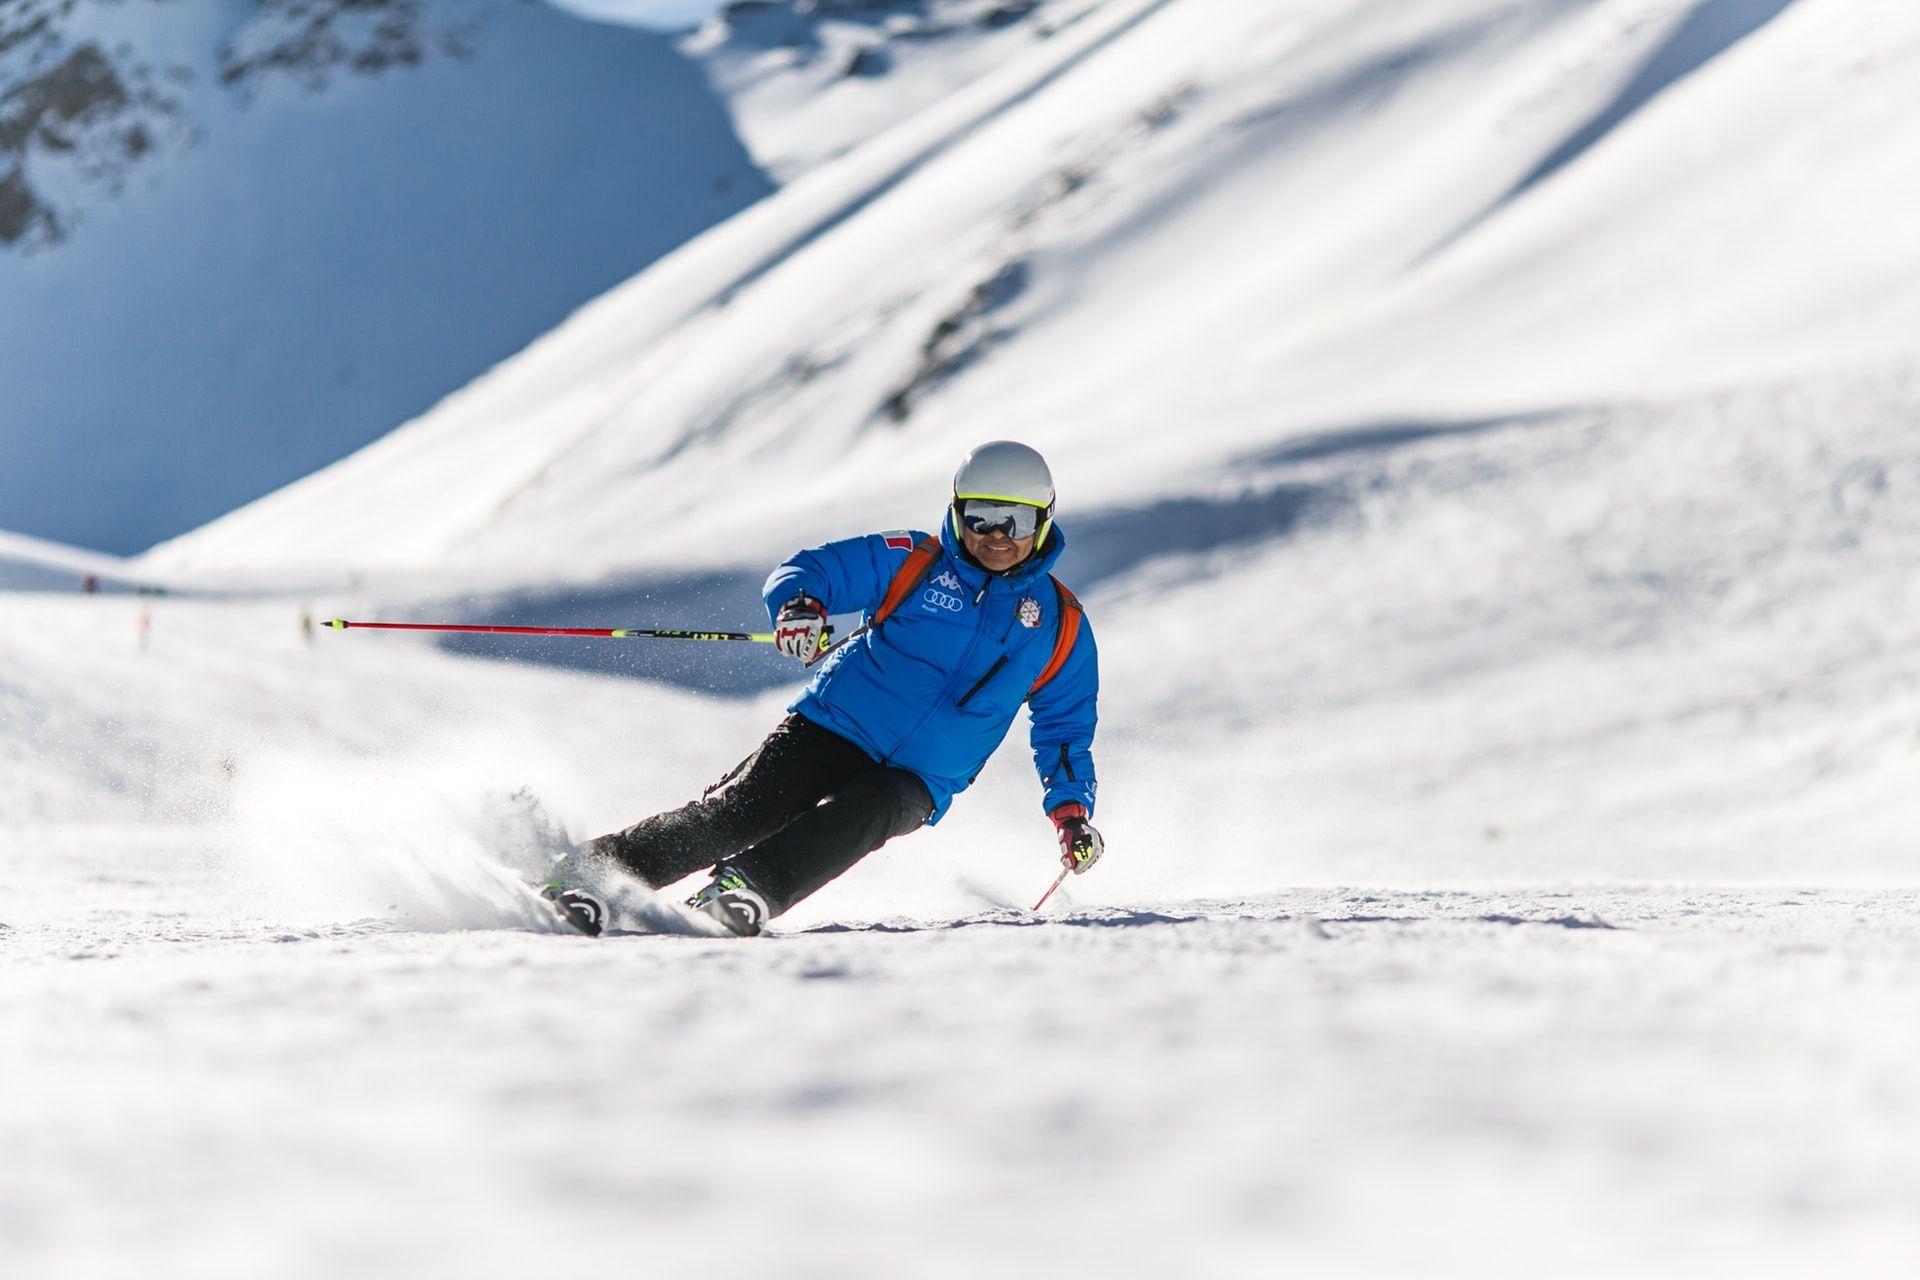 Kijki narciarskie - propozycje na sezon 2020